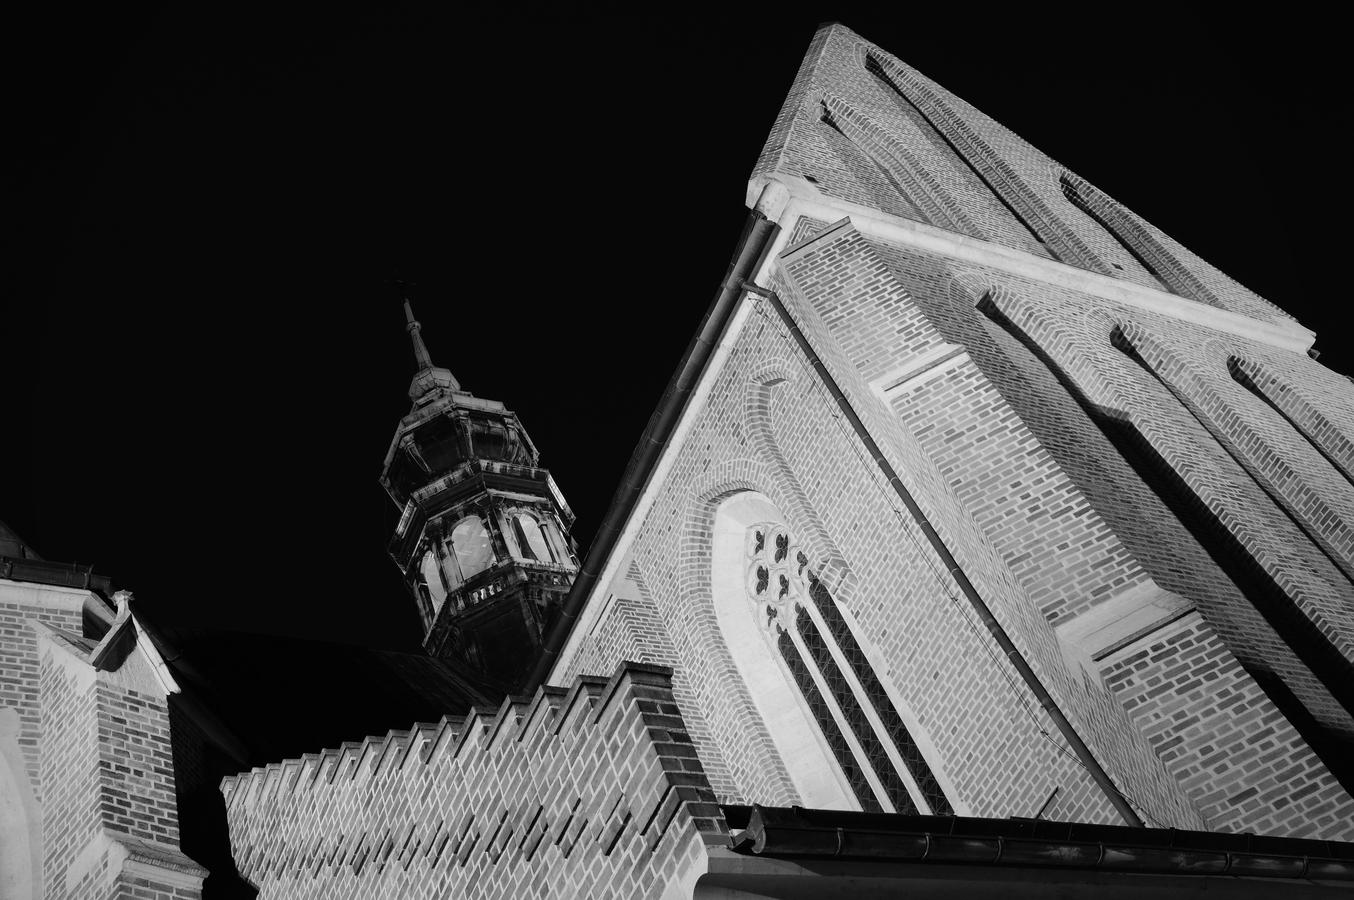 Bazilika Nanebevzetí Panny Marie